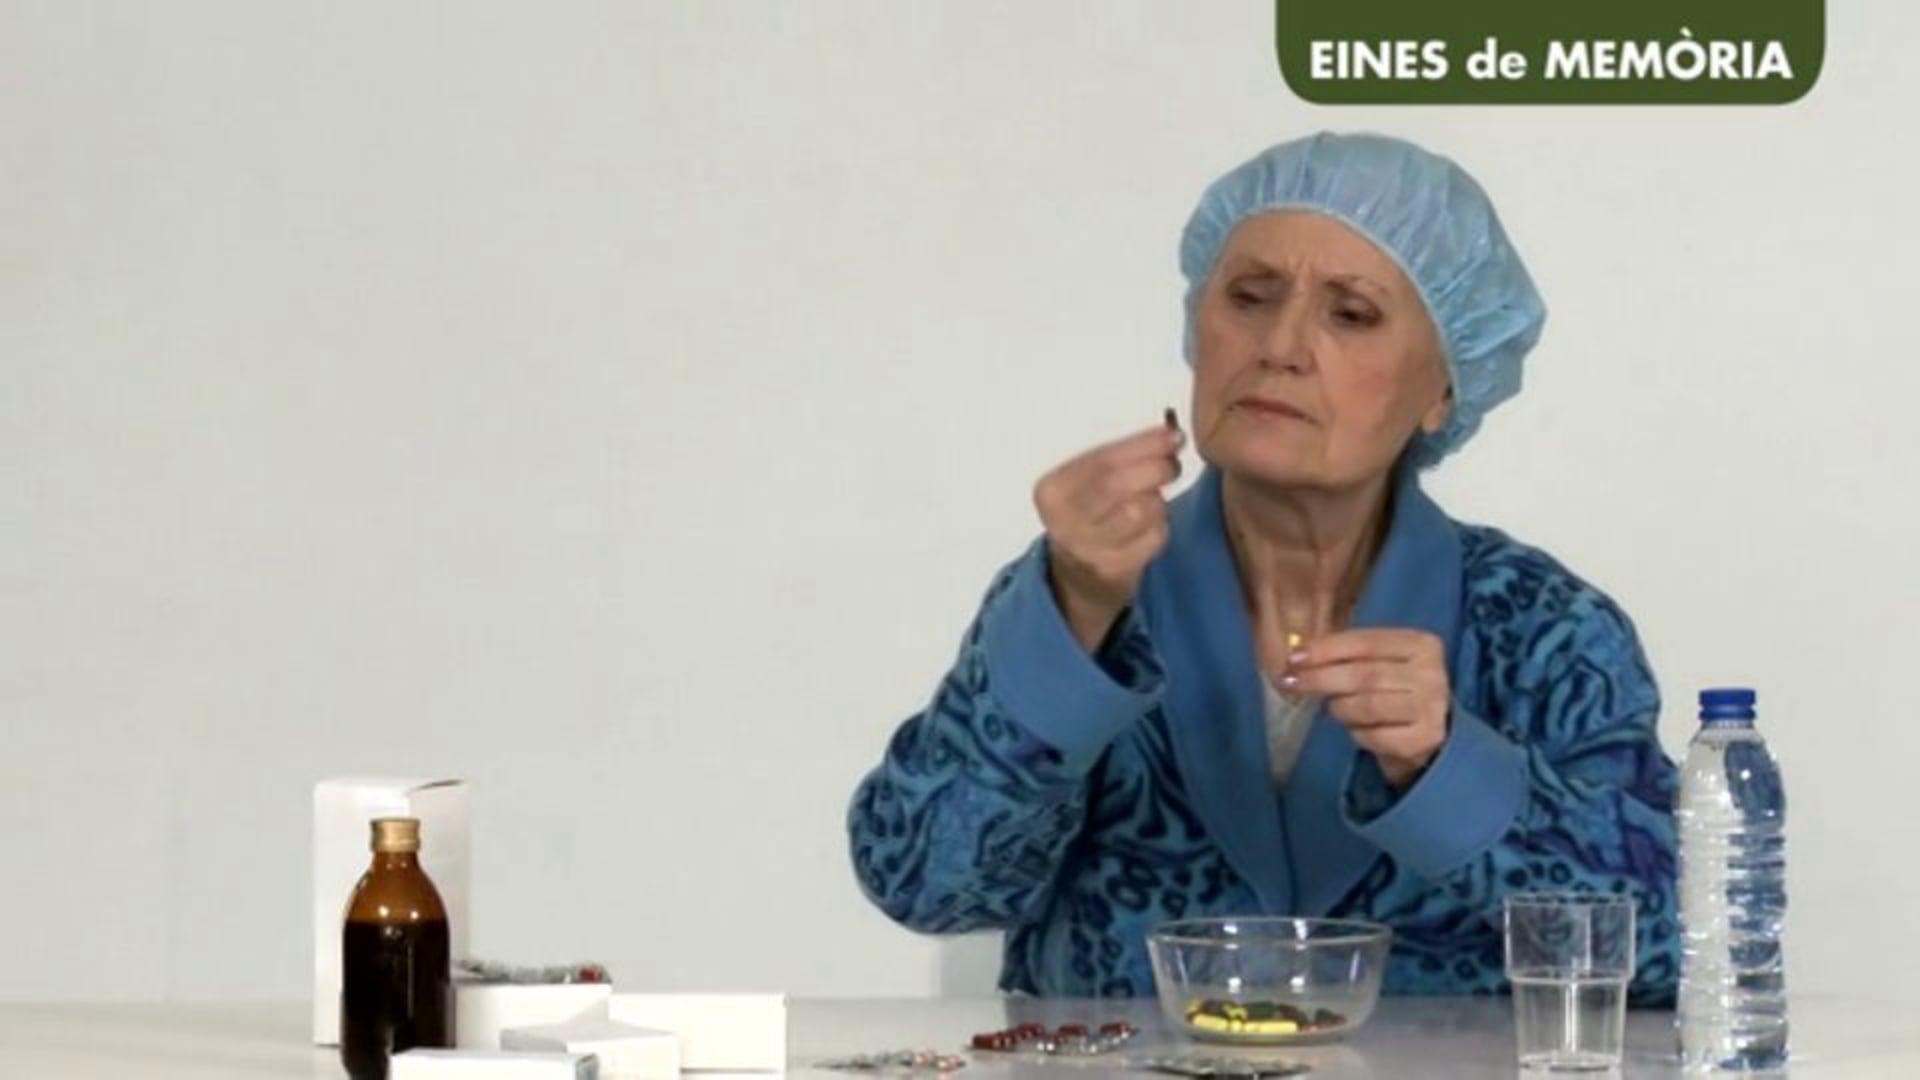 Eines de memoria / Medicament 360